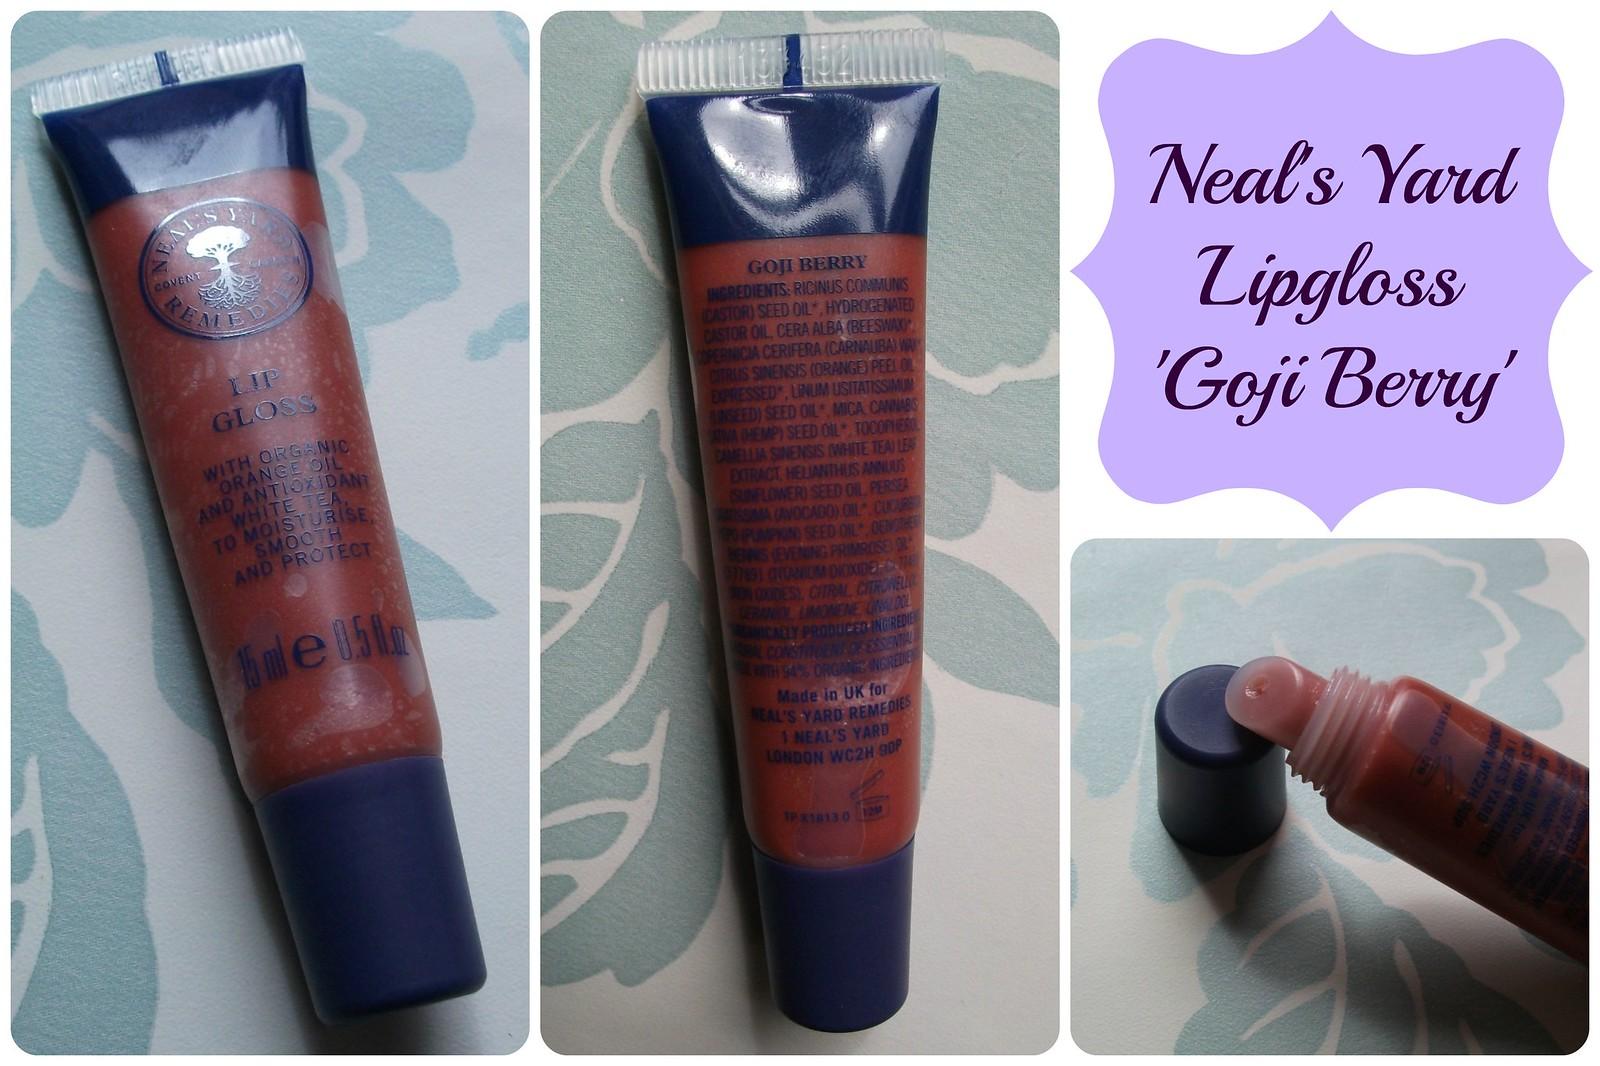 Neal's Yard Lipgloss Goji Berry